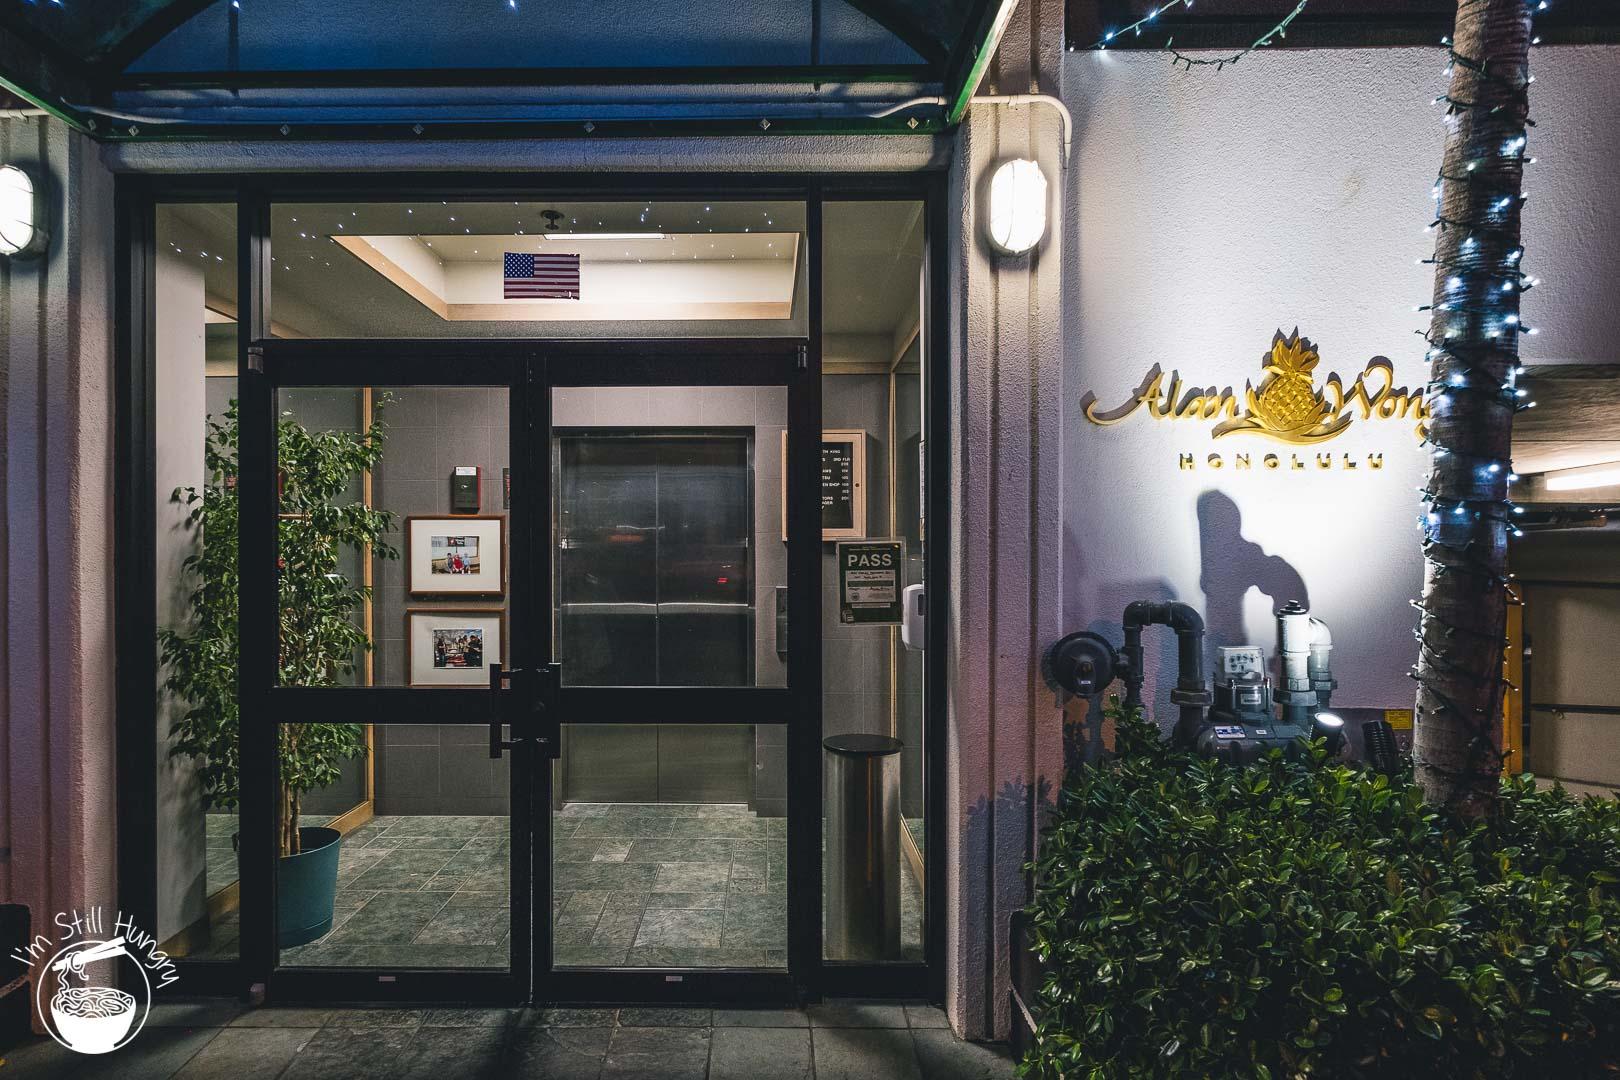 Alan Wong's Honolulu